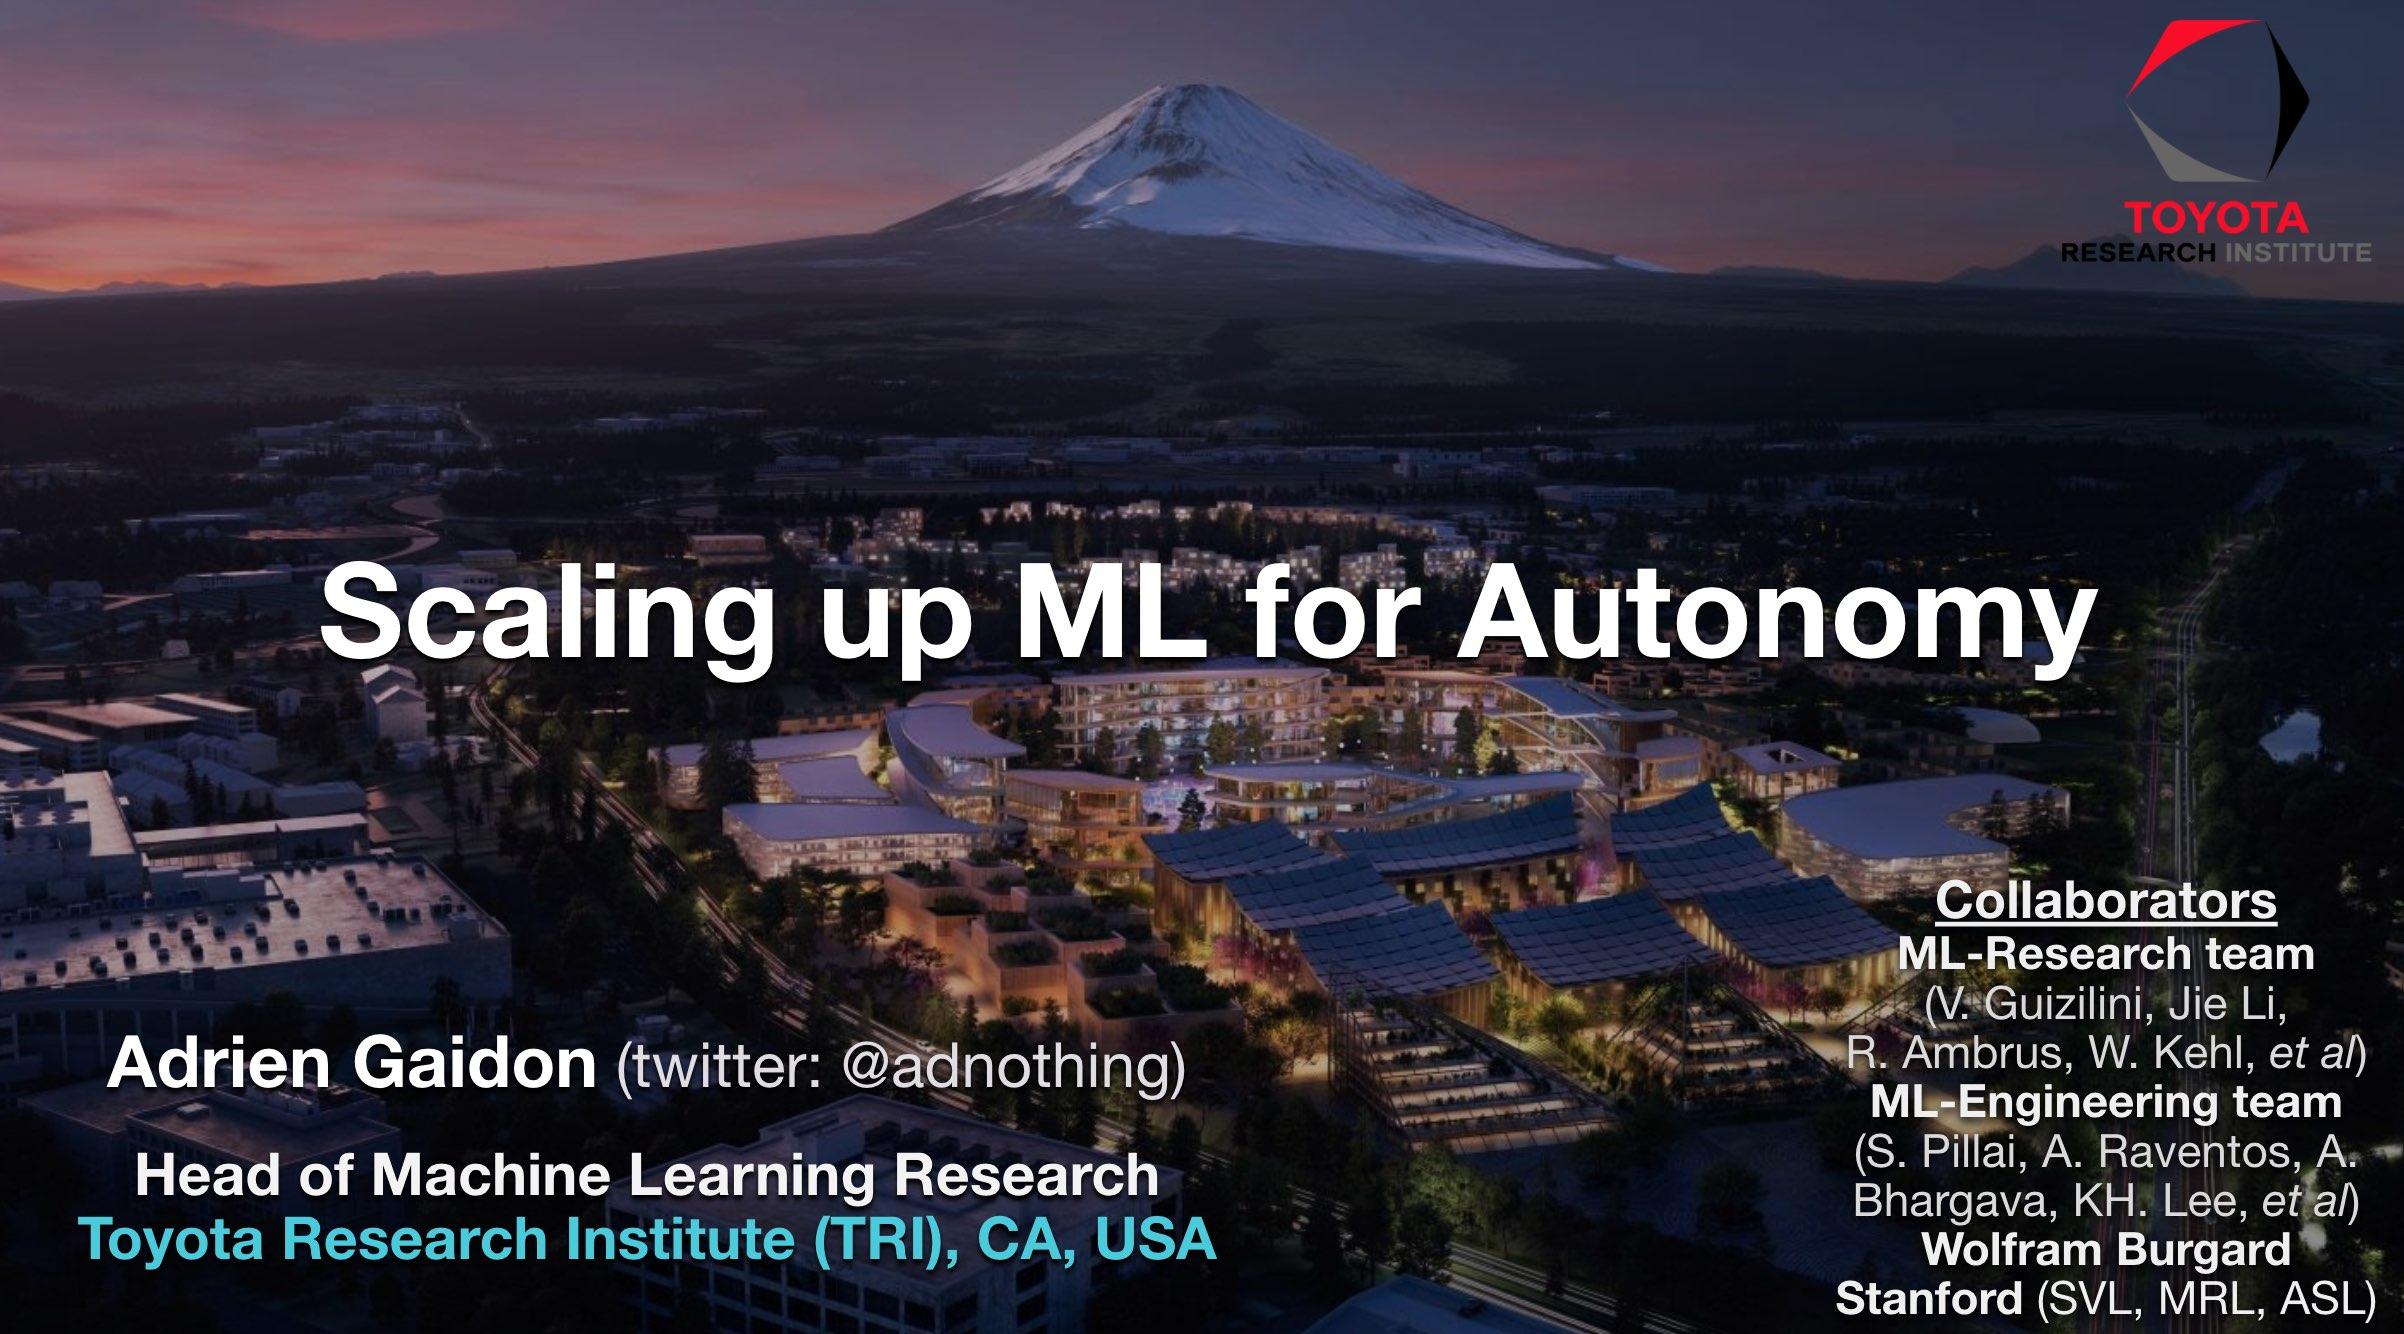 Scaling Up ML for Autonomy - Talk at Wayve, April 2020